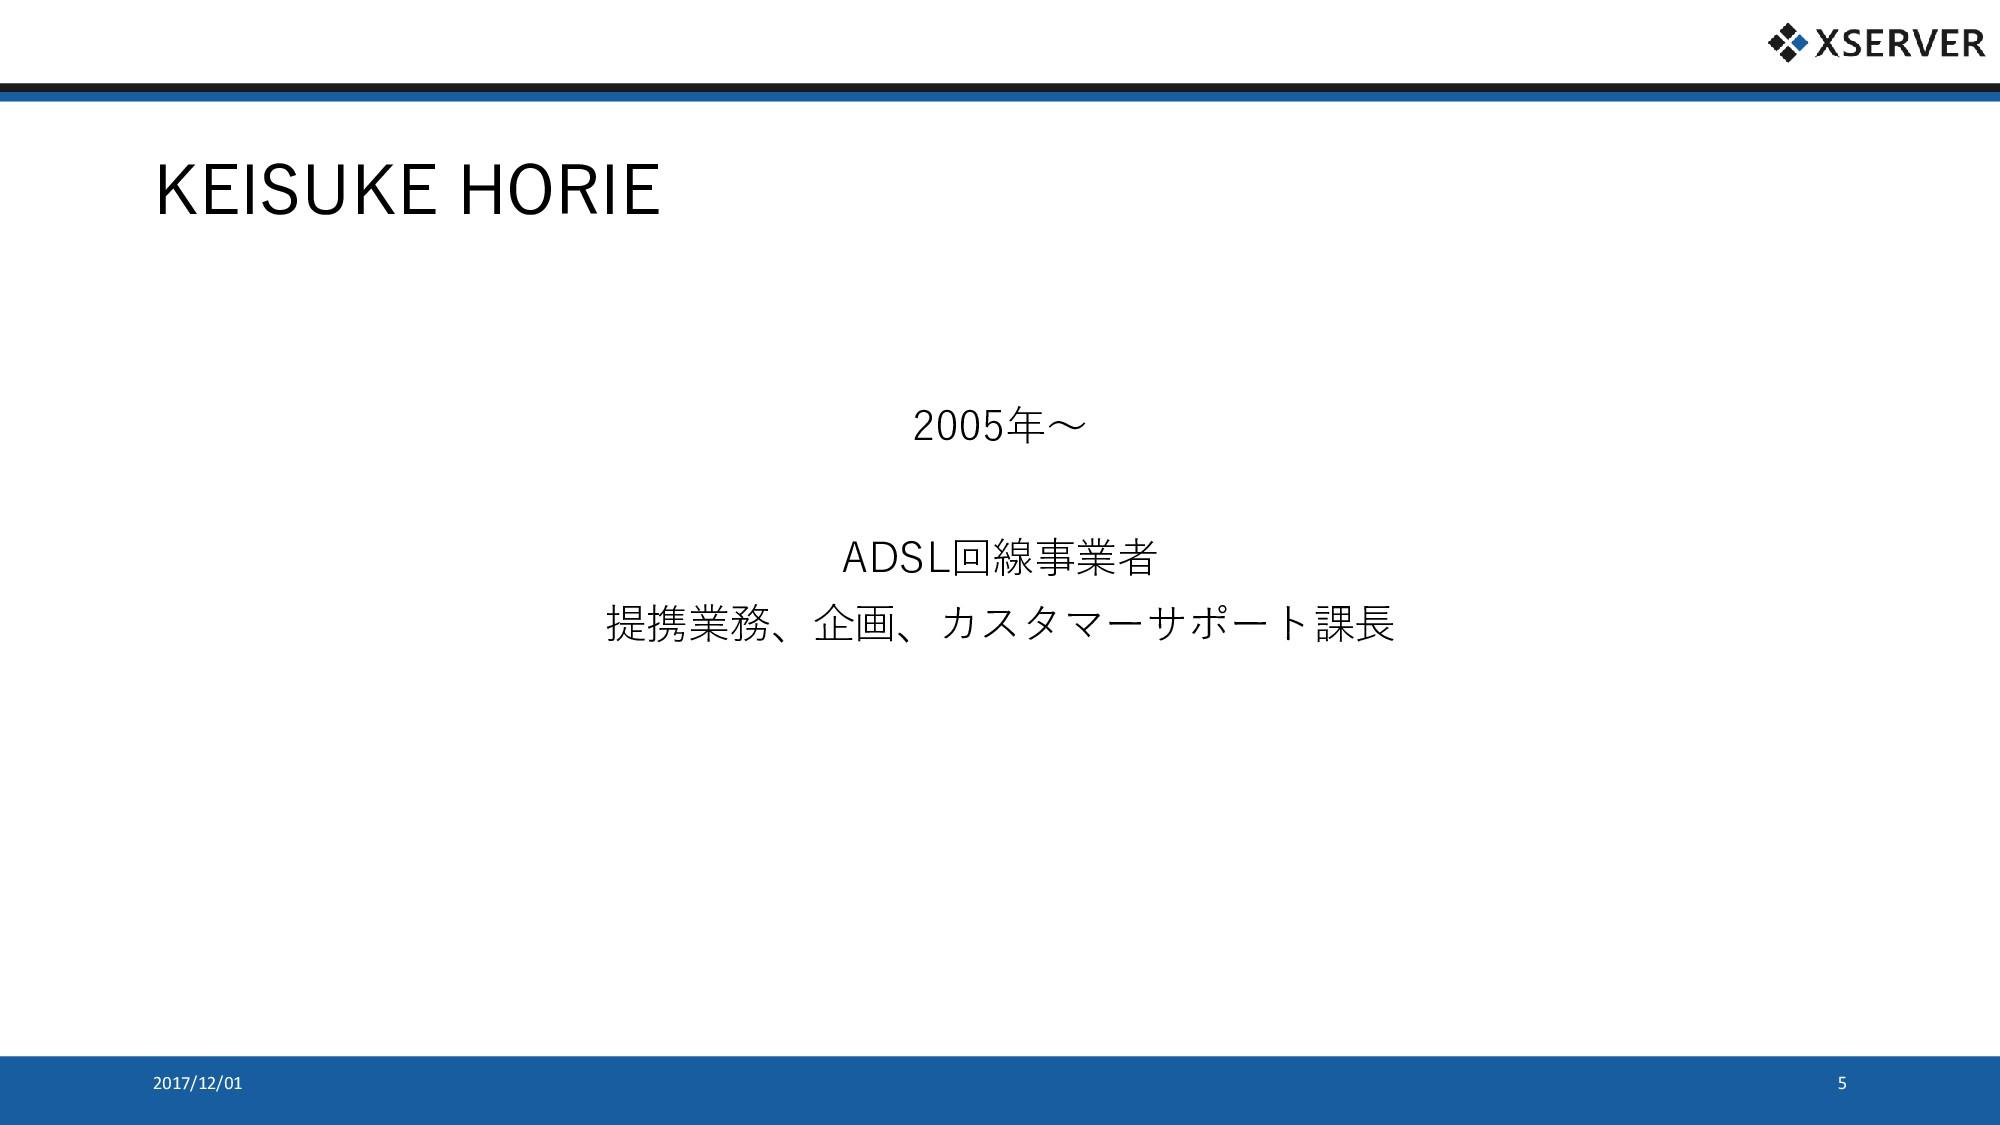 KEISUKE HORIE 2005年~ ADSL回線事業者 提携業務、企画、カスタマーサポー...